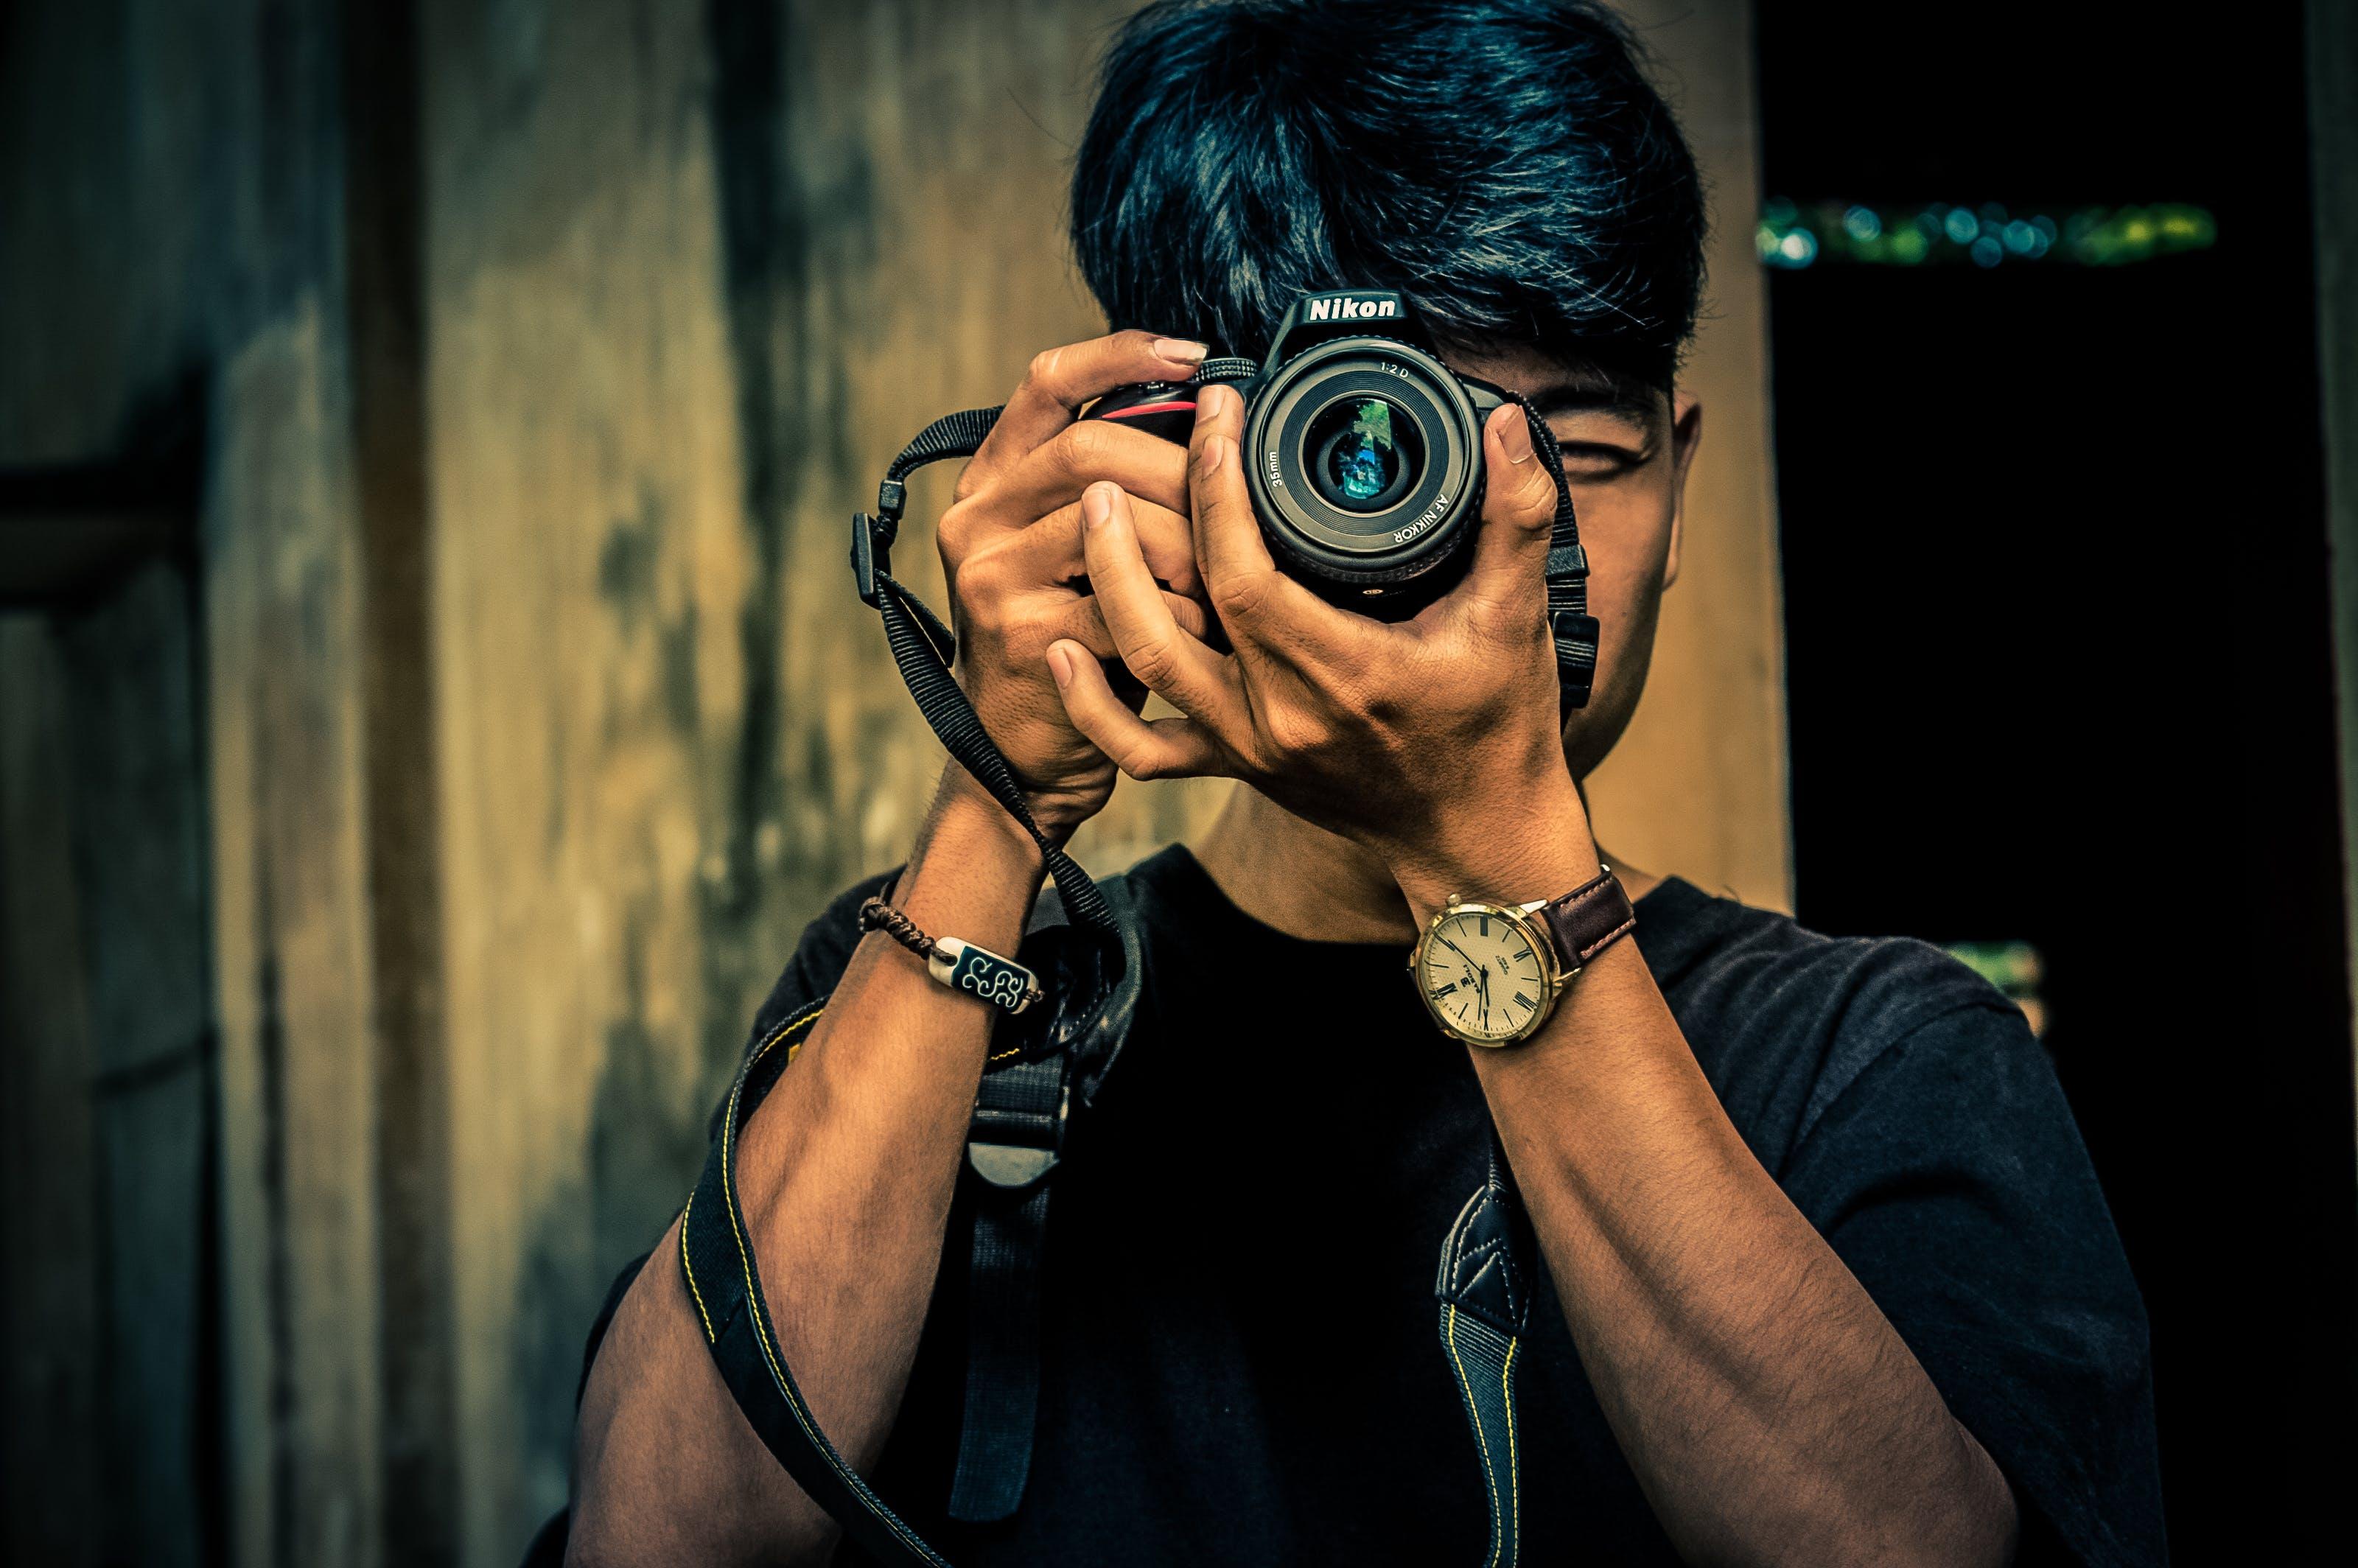 asian man, camera, fashion